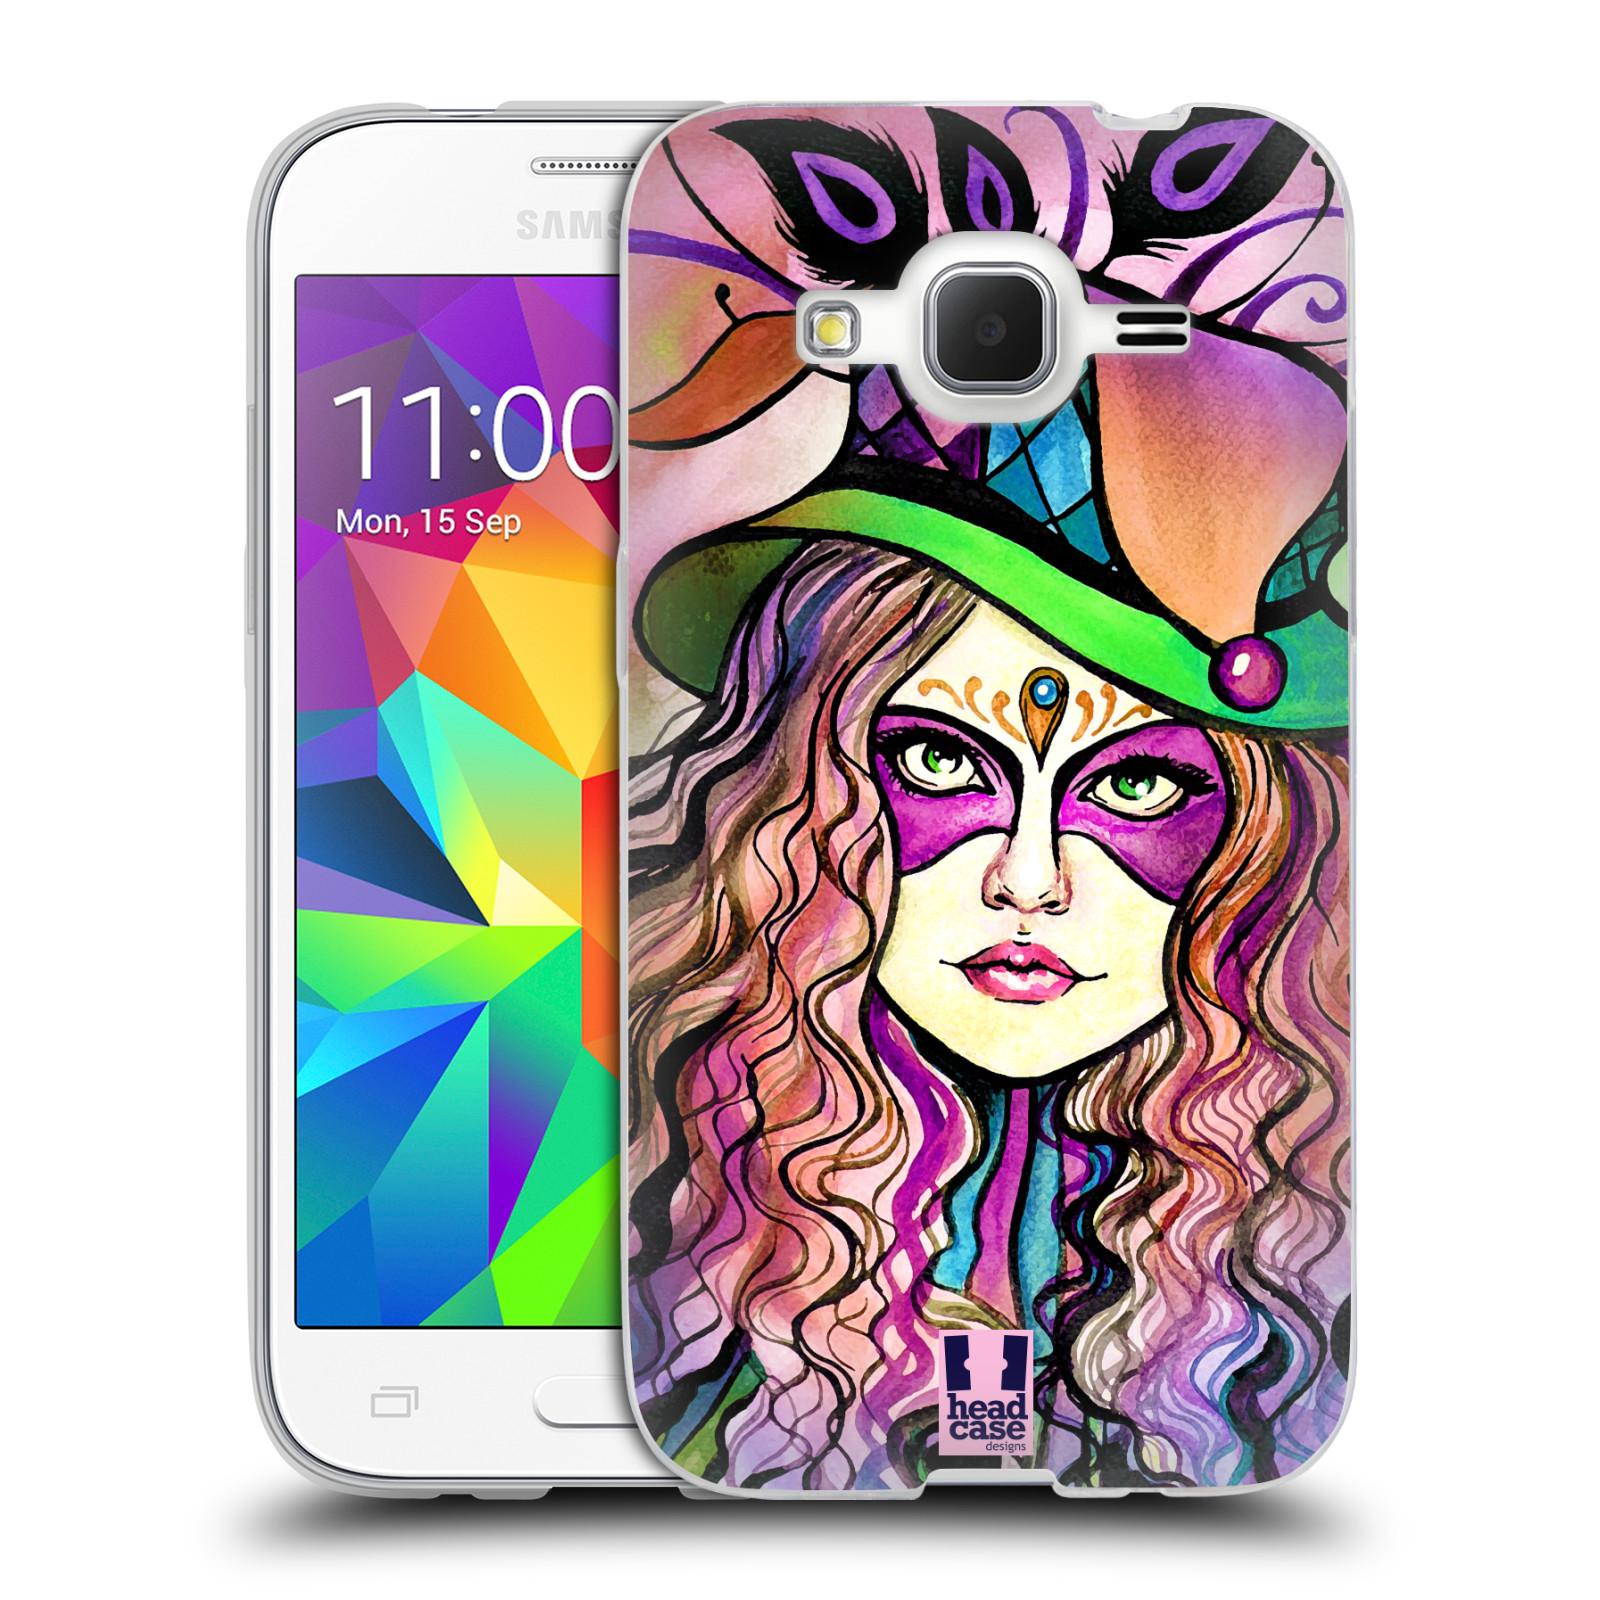 HEAD CASE silikonový obal na mobil Samsung Galaxy Core Prime (G360) vzor Maškarní ples masky kreslené vzory KLOBOUK